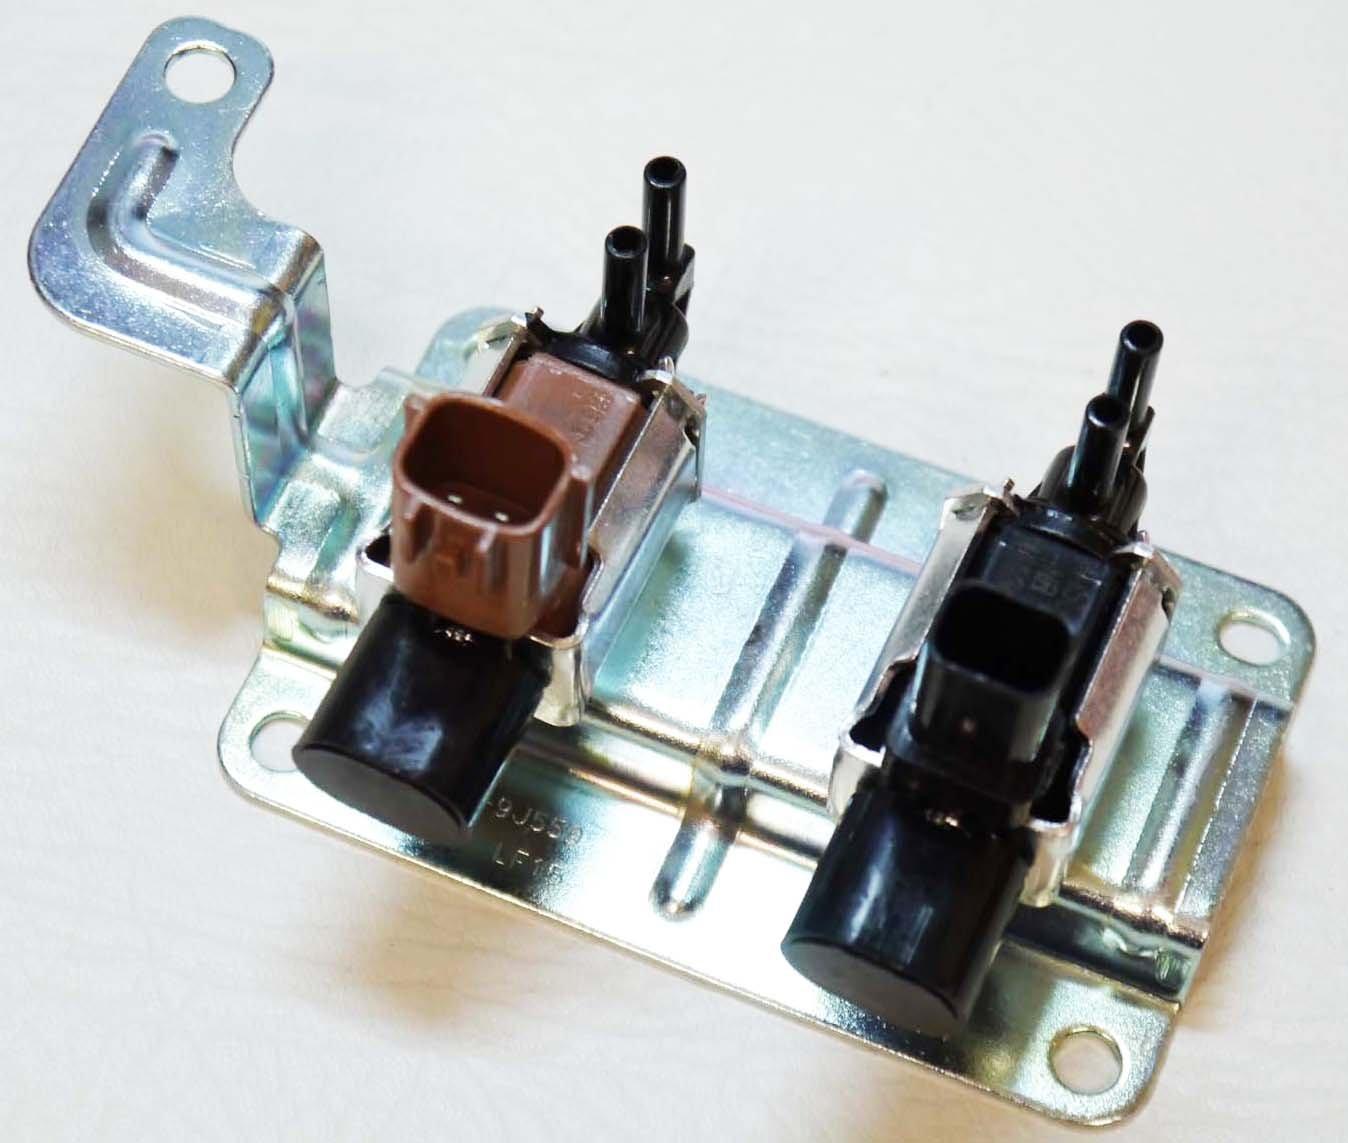 Umbra Rimorchi Nissan Kubistar VAN MPV 2004 to 2007 Fixed Swan Neck Towbar UT310COR96ZFMUK2